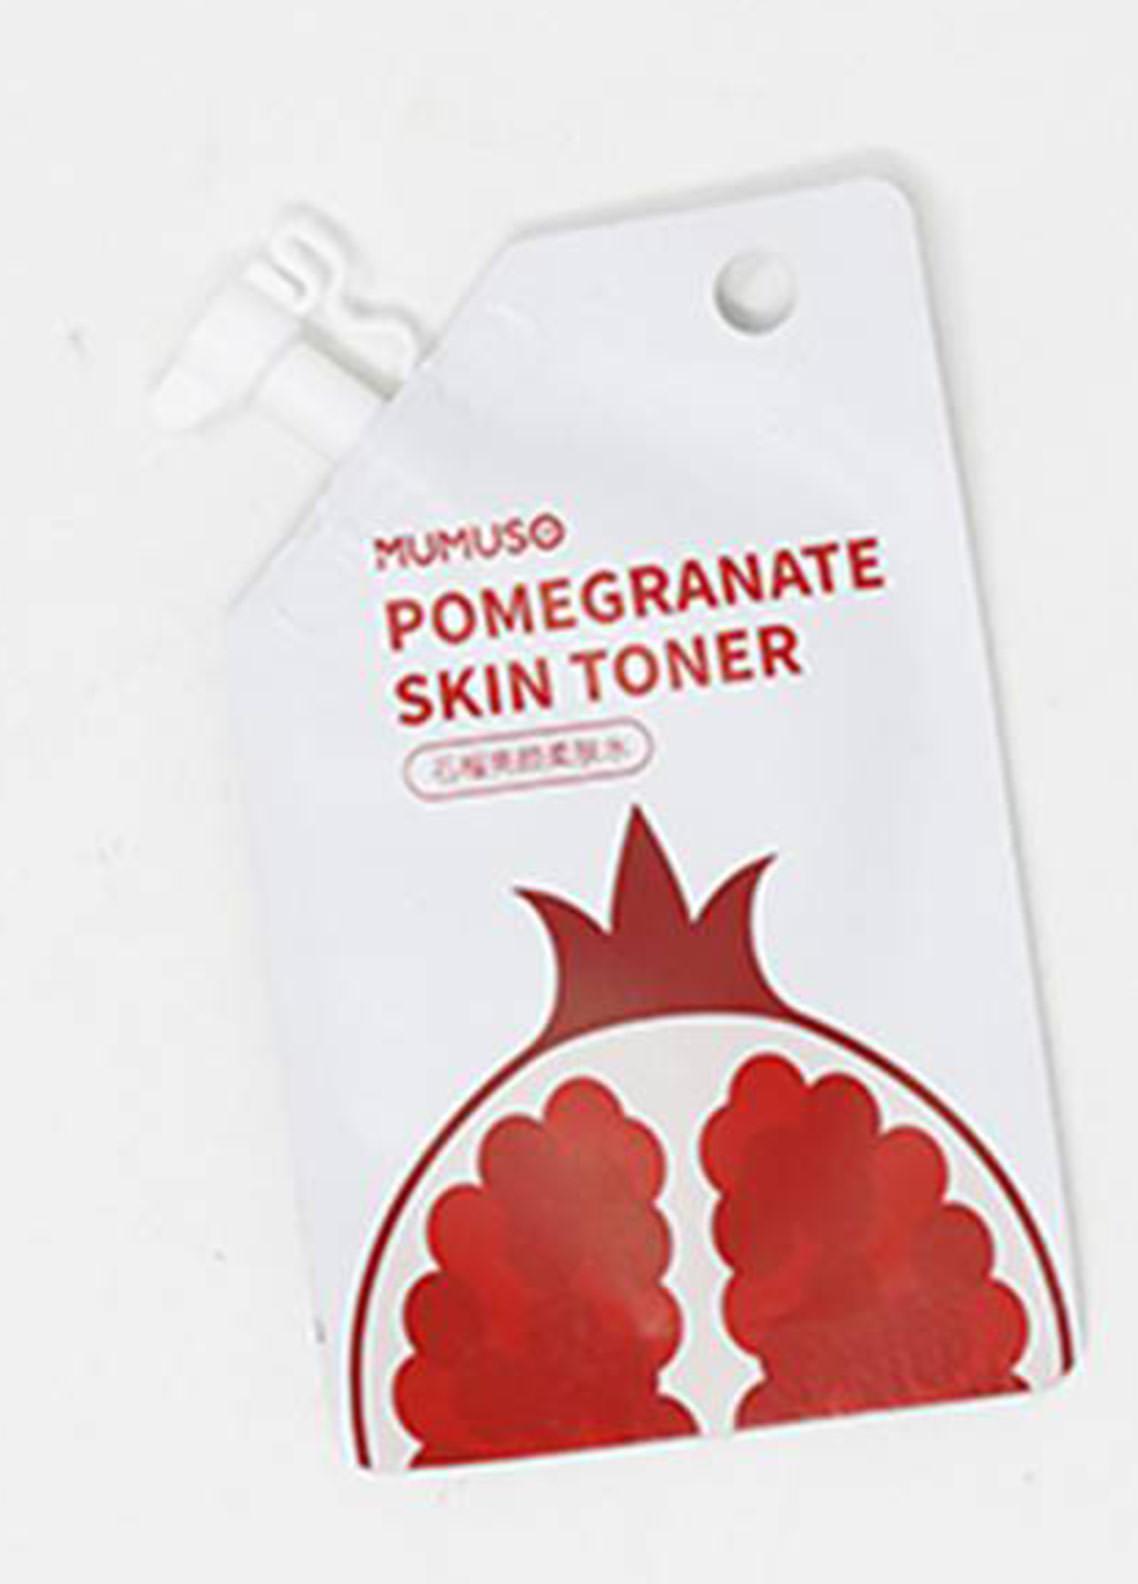 Mumuso Pomegranate Skin Toner 385